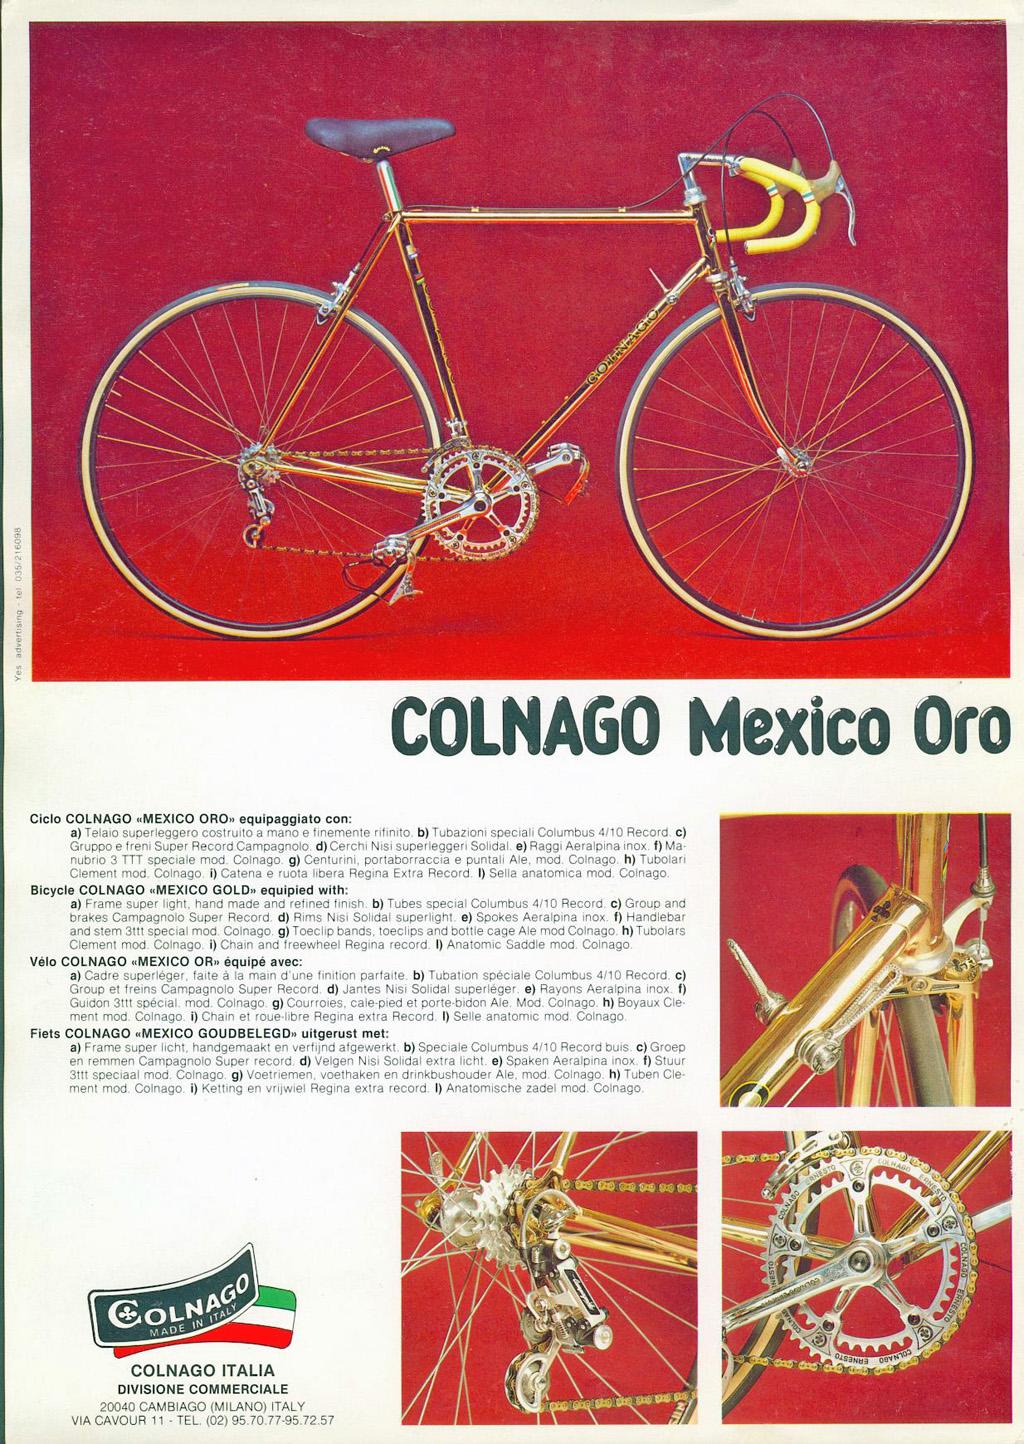 Projet Colnago Super 1975-1977 (Montage terminé) - Page 2 35dd1510